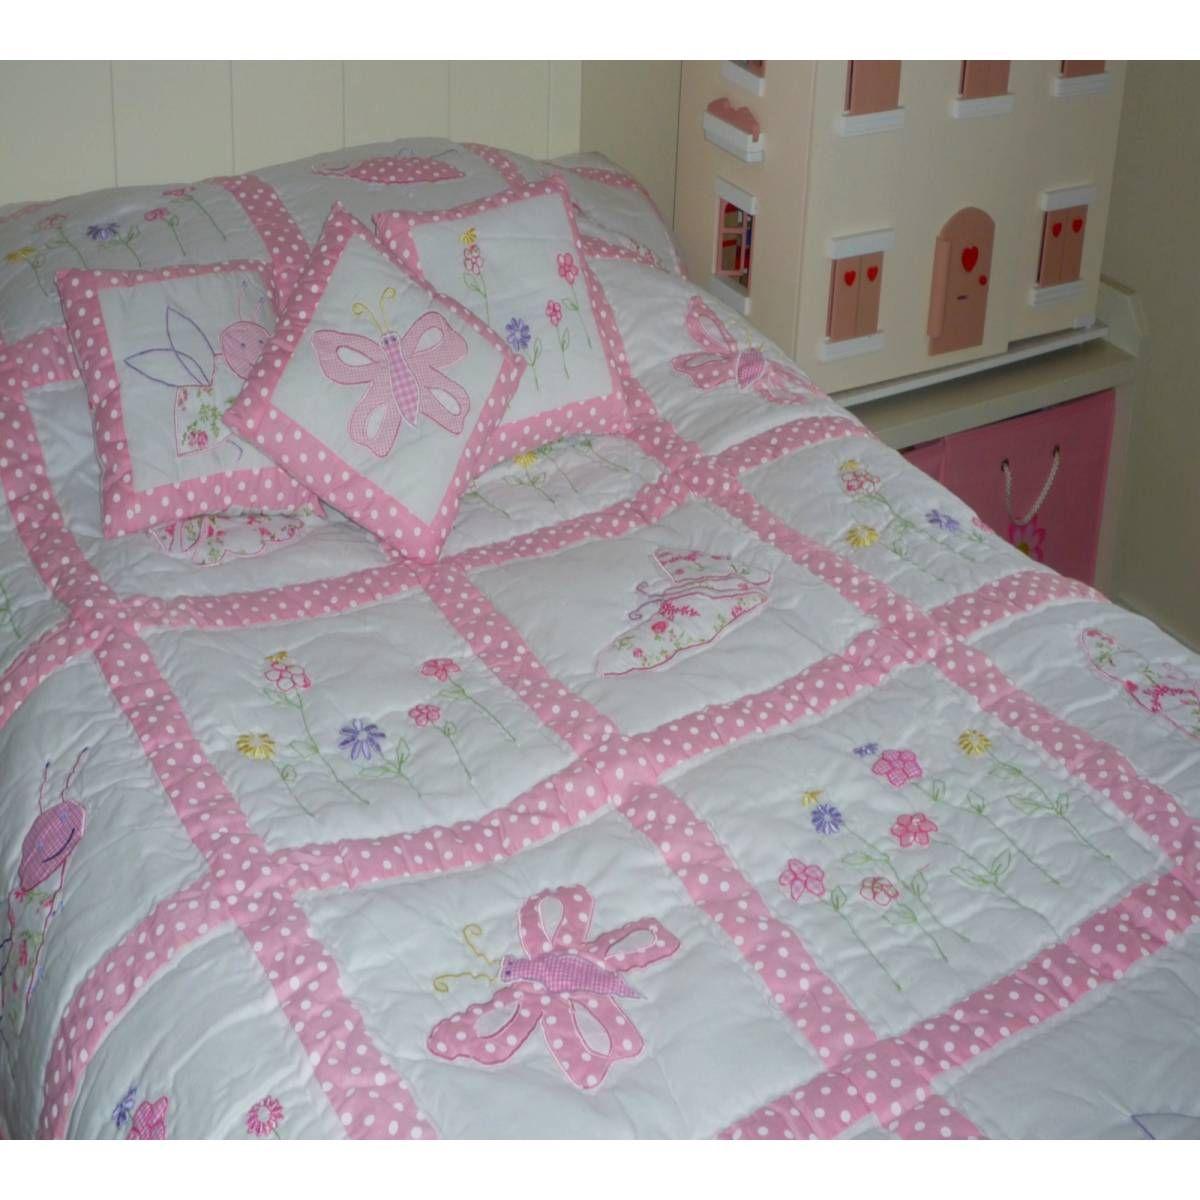 patchwork quilts | ... › Bedding › Bedspreads › Country Garden Girls ...